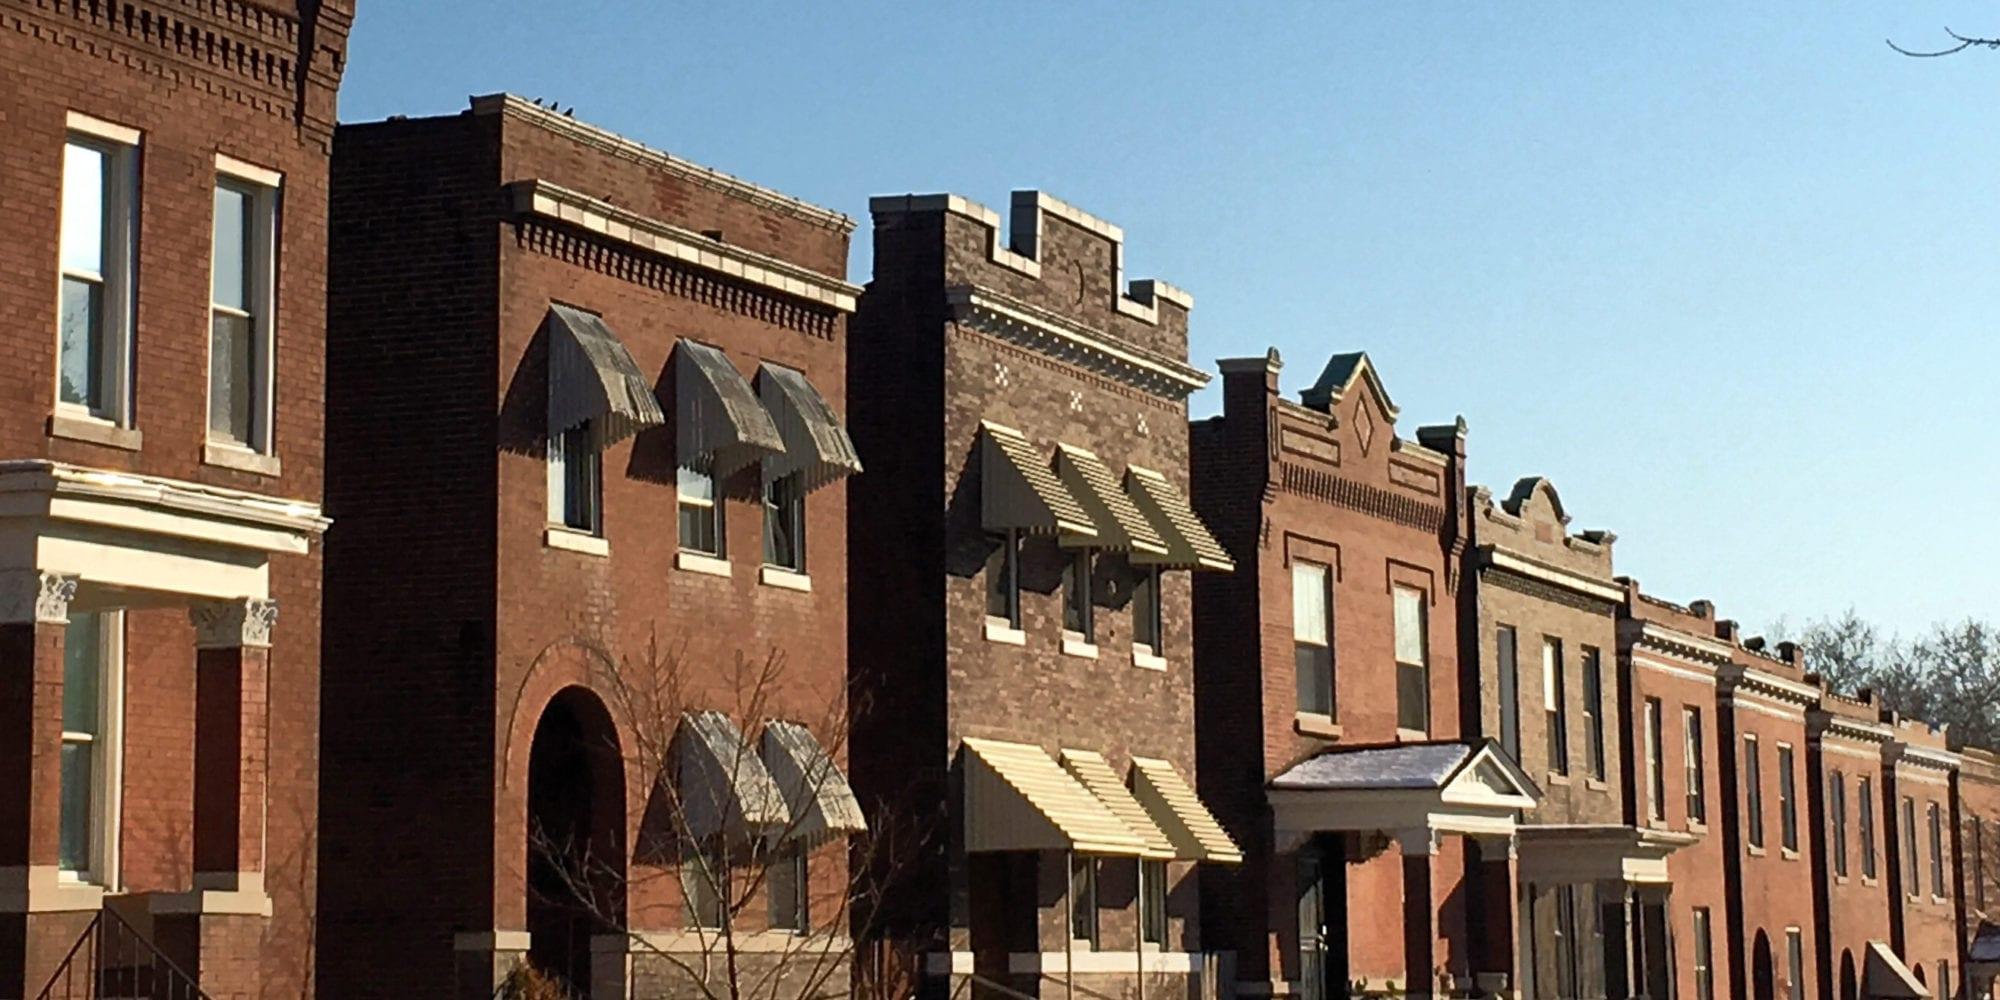 Dutchtown homes. Photo by Josh Burbridge.